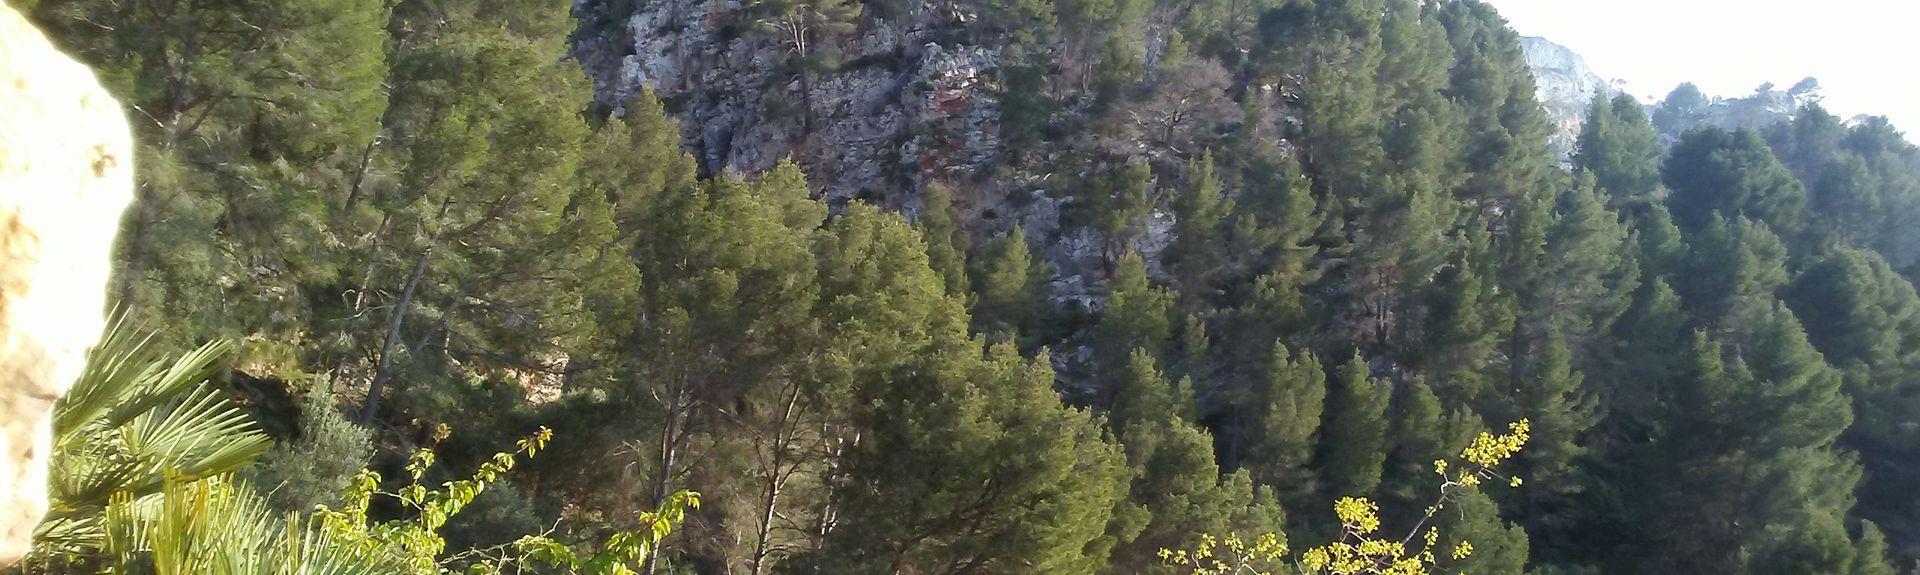 Puigpunyent, Balearic Islands, Spain